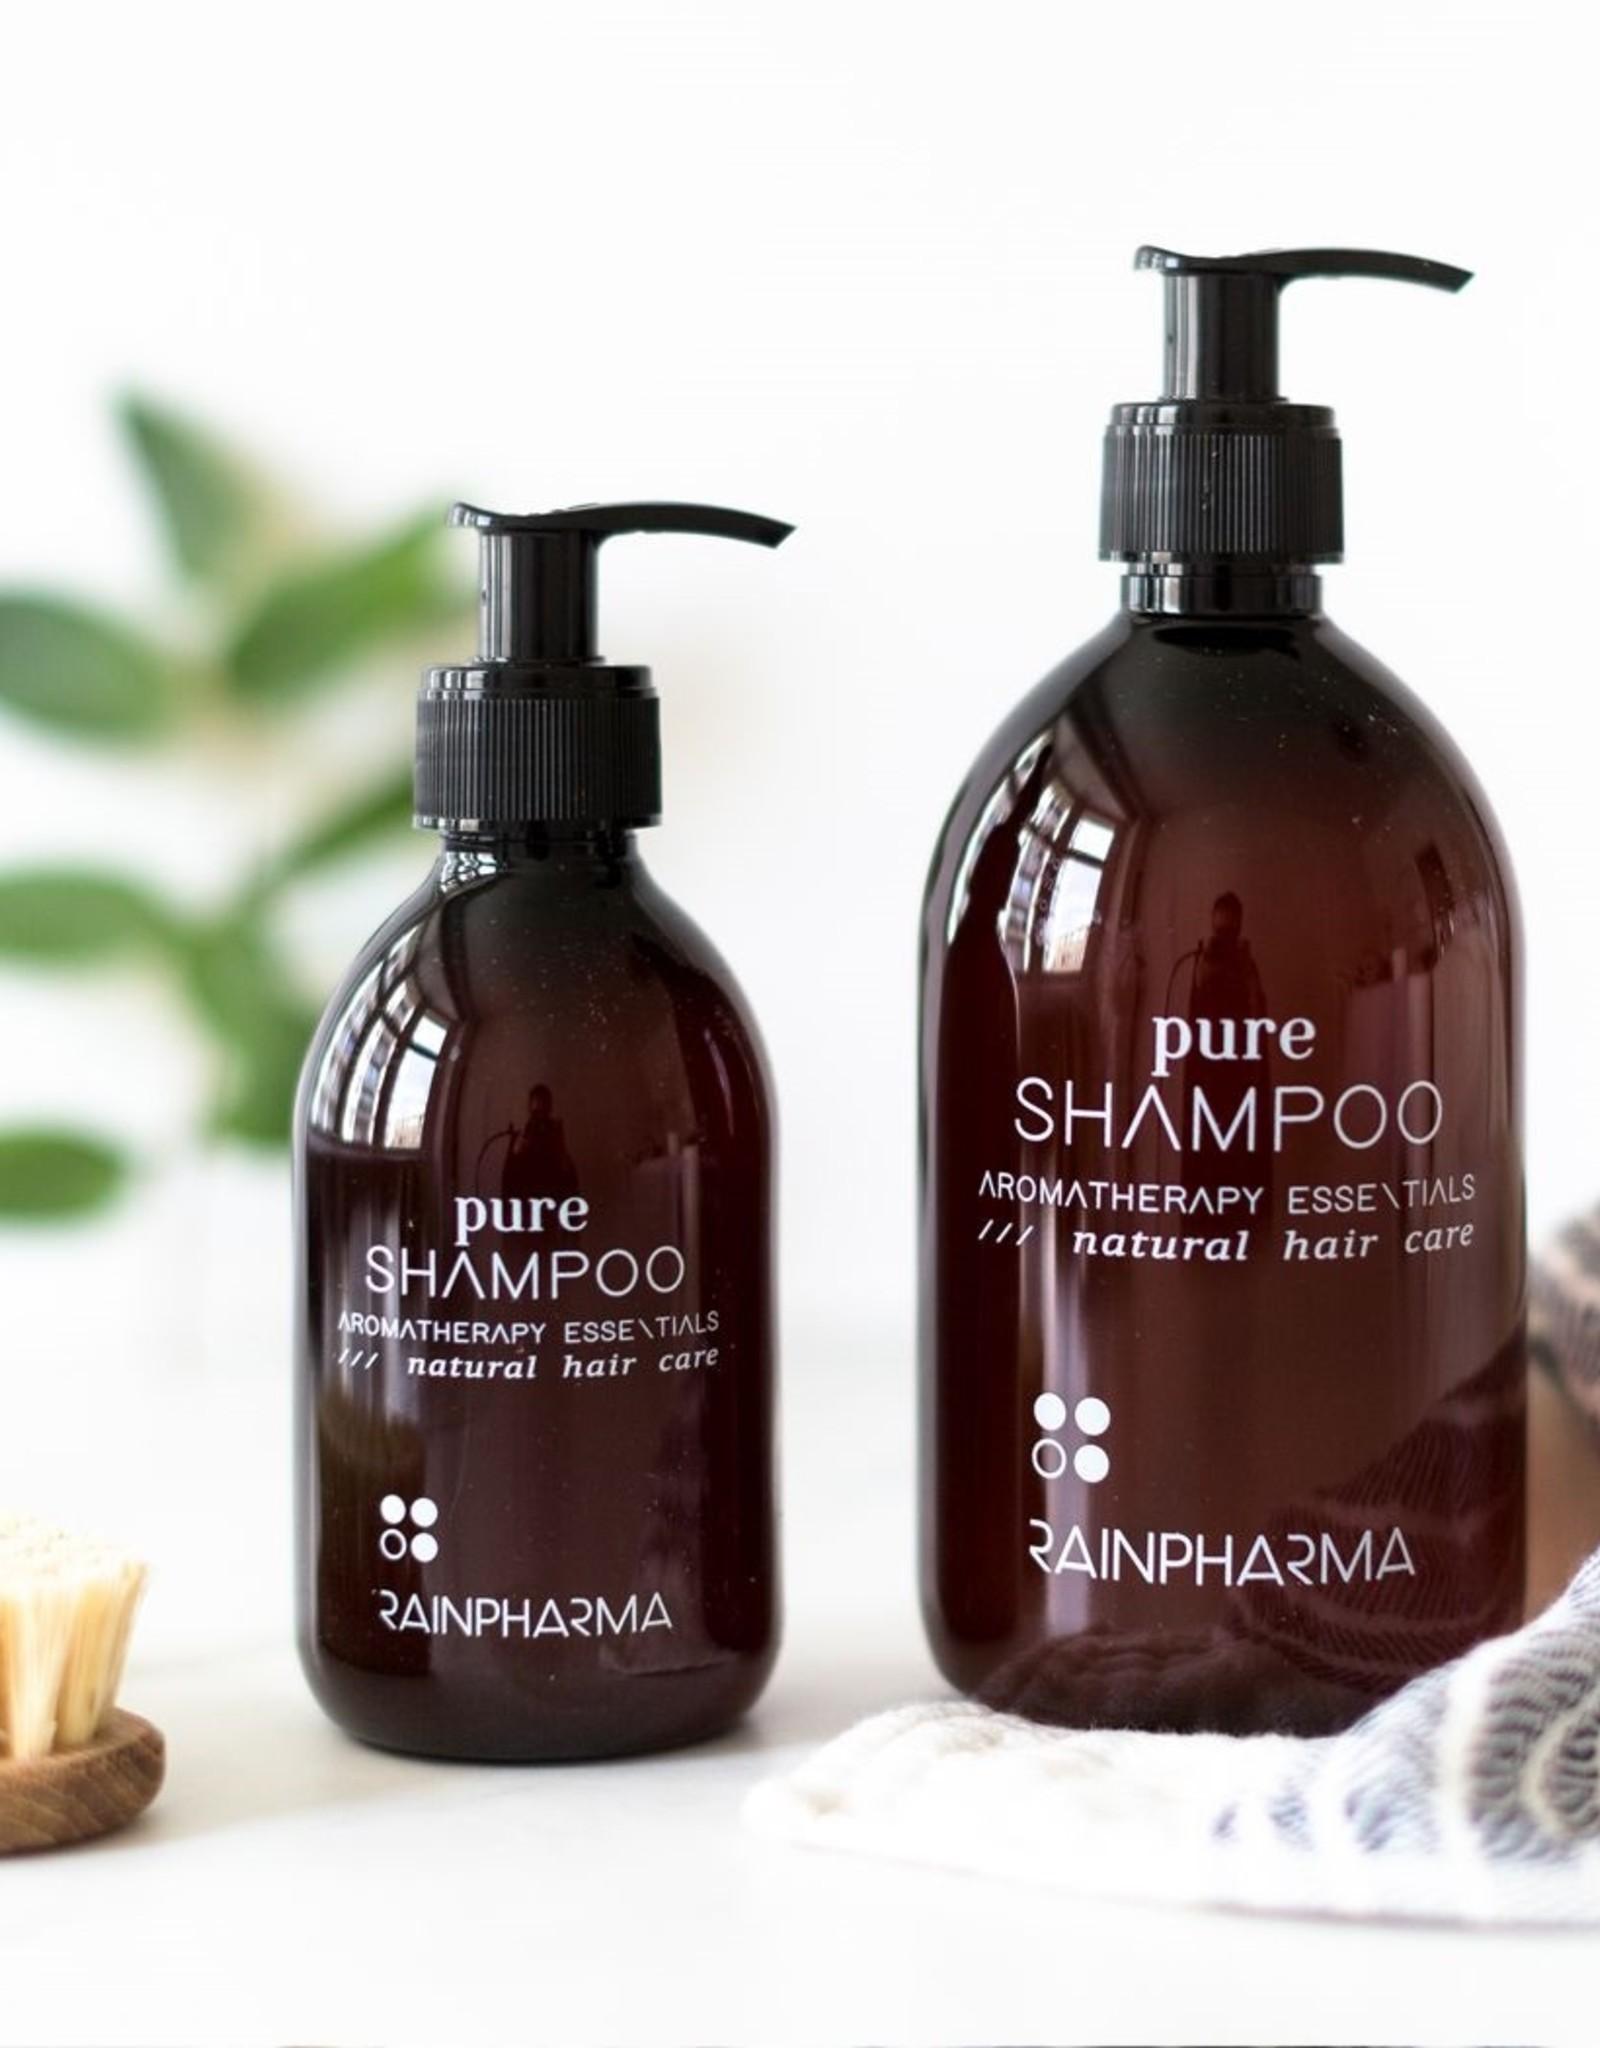 RainPharma Rainpharma - Pure Shampoo 250ml